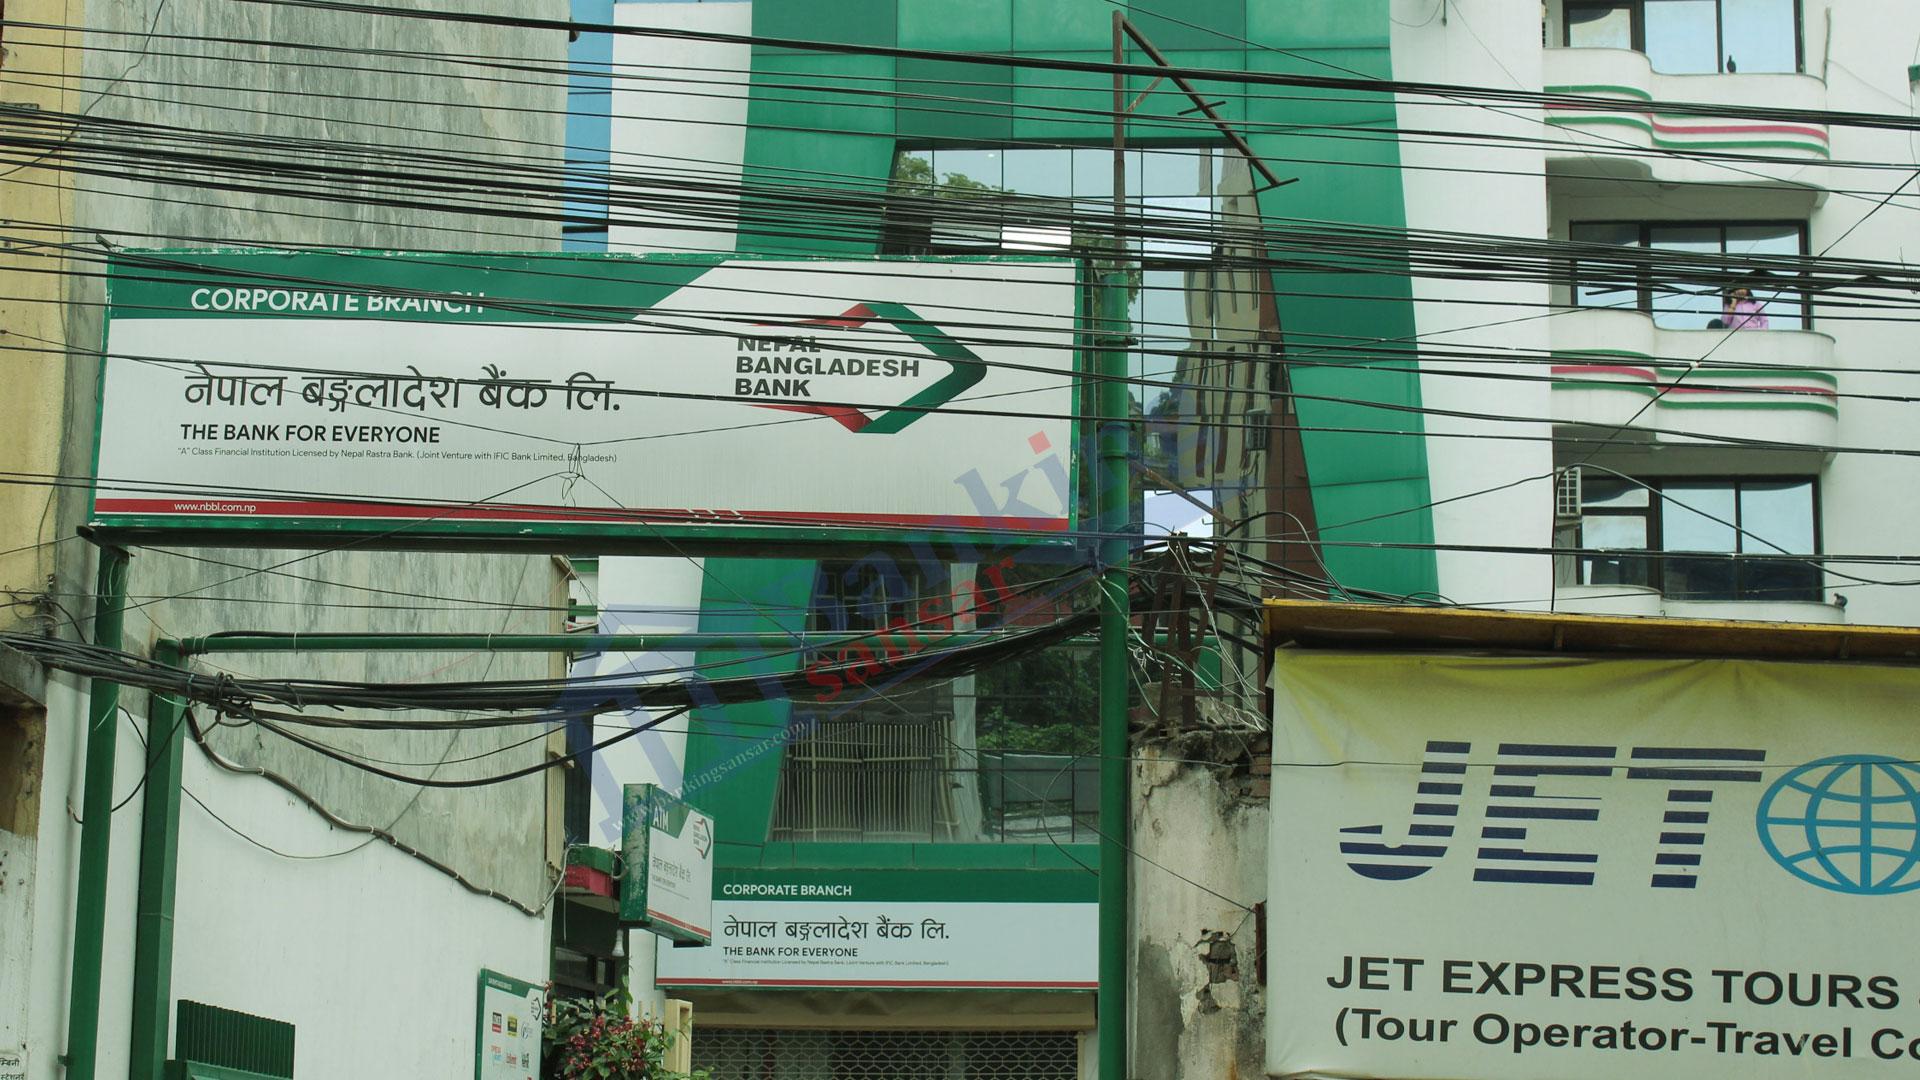 Nepal Bangladesh Bank